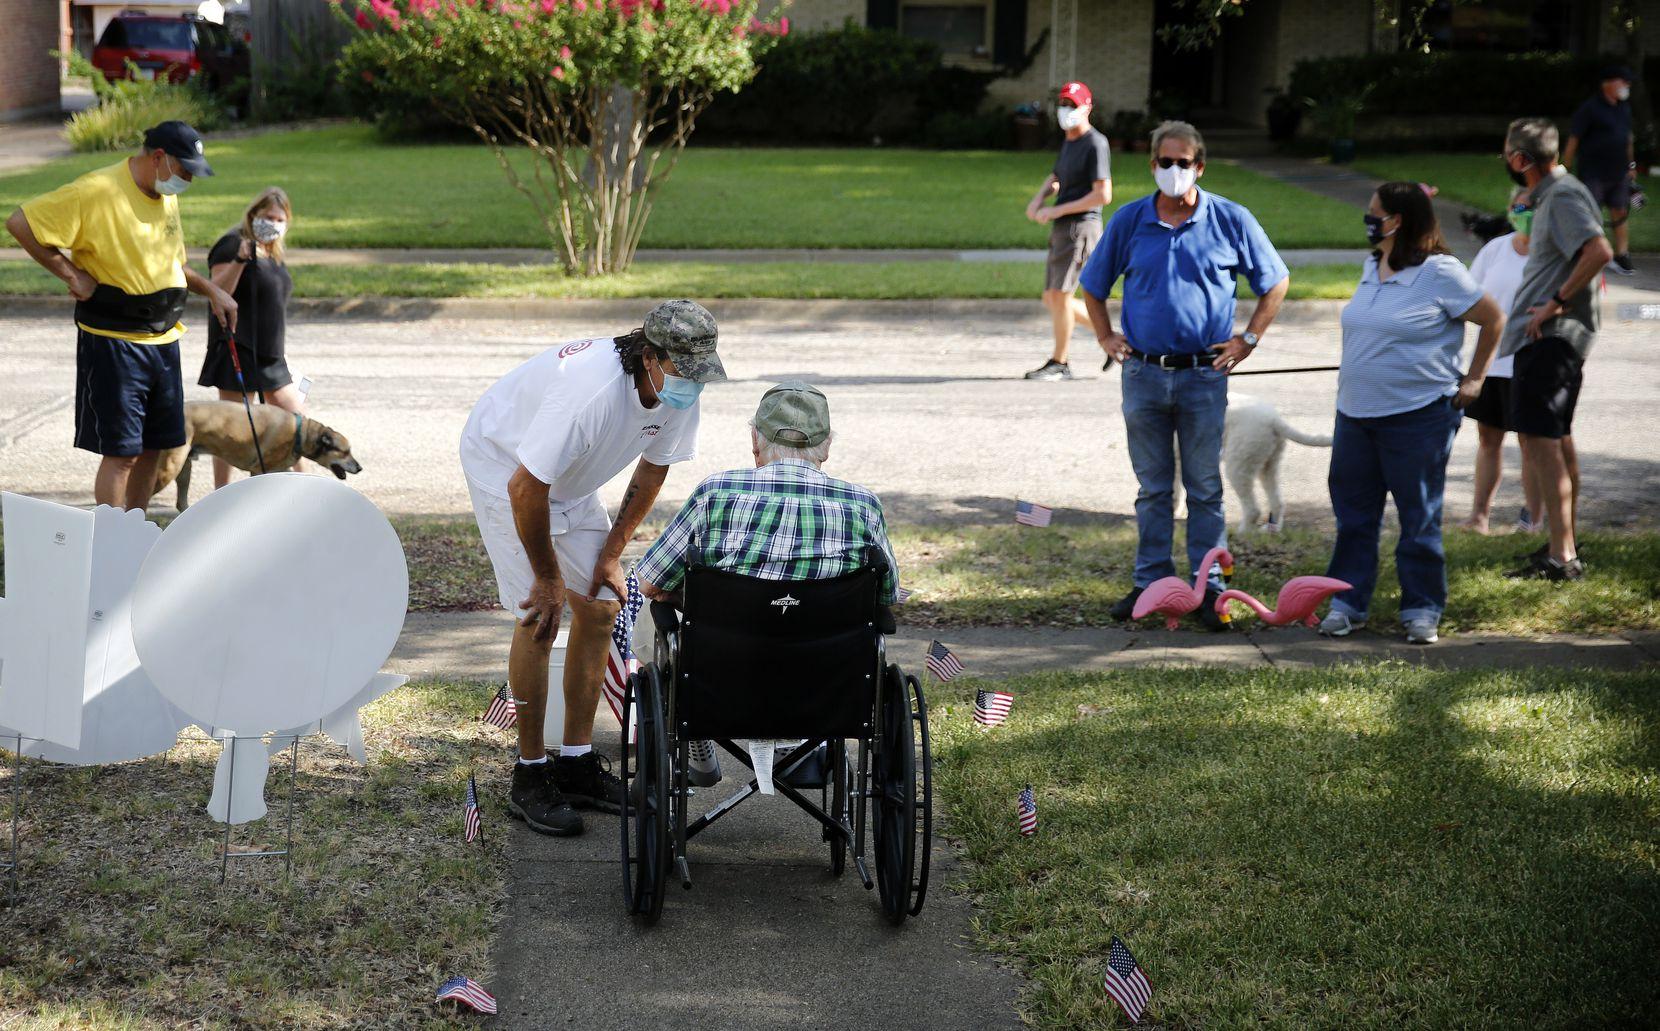 Next-door neighbor Mark Batchelor (center-left) was among Dieter's many congratulants.